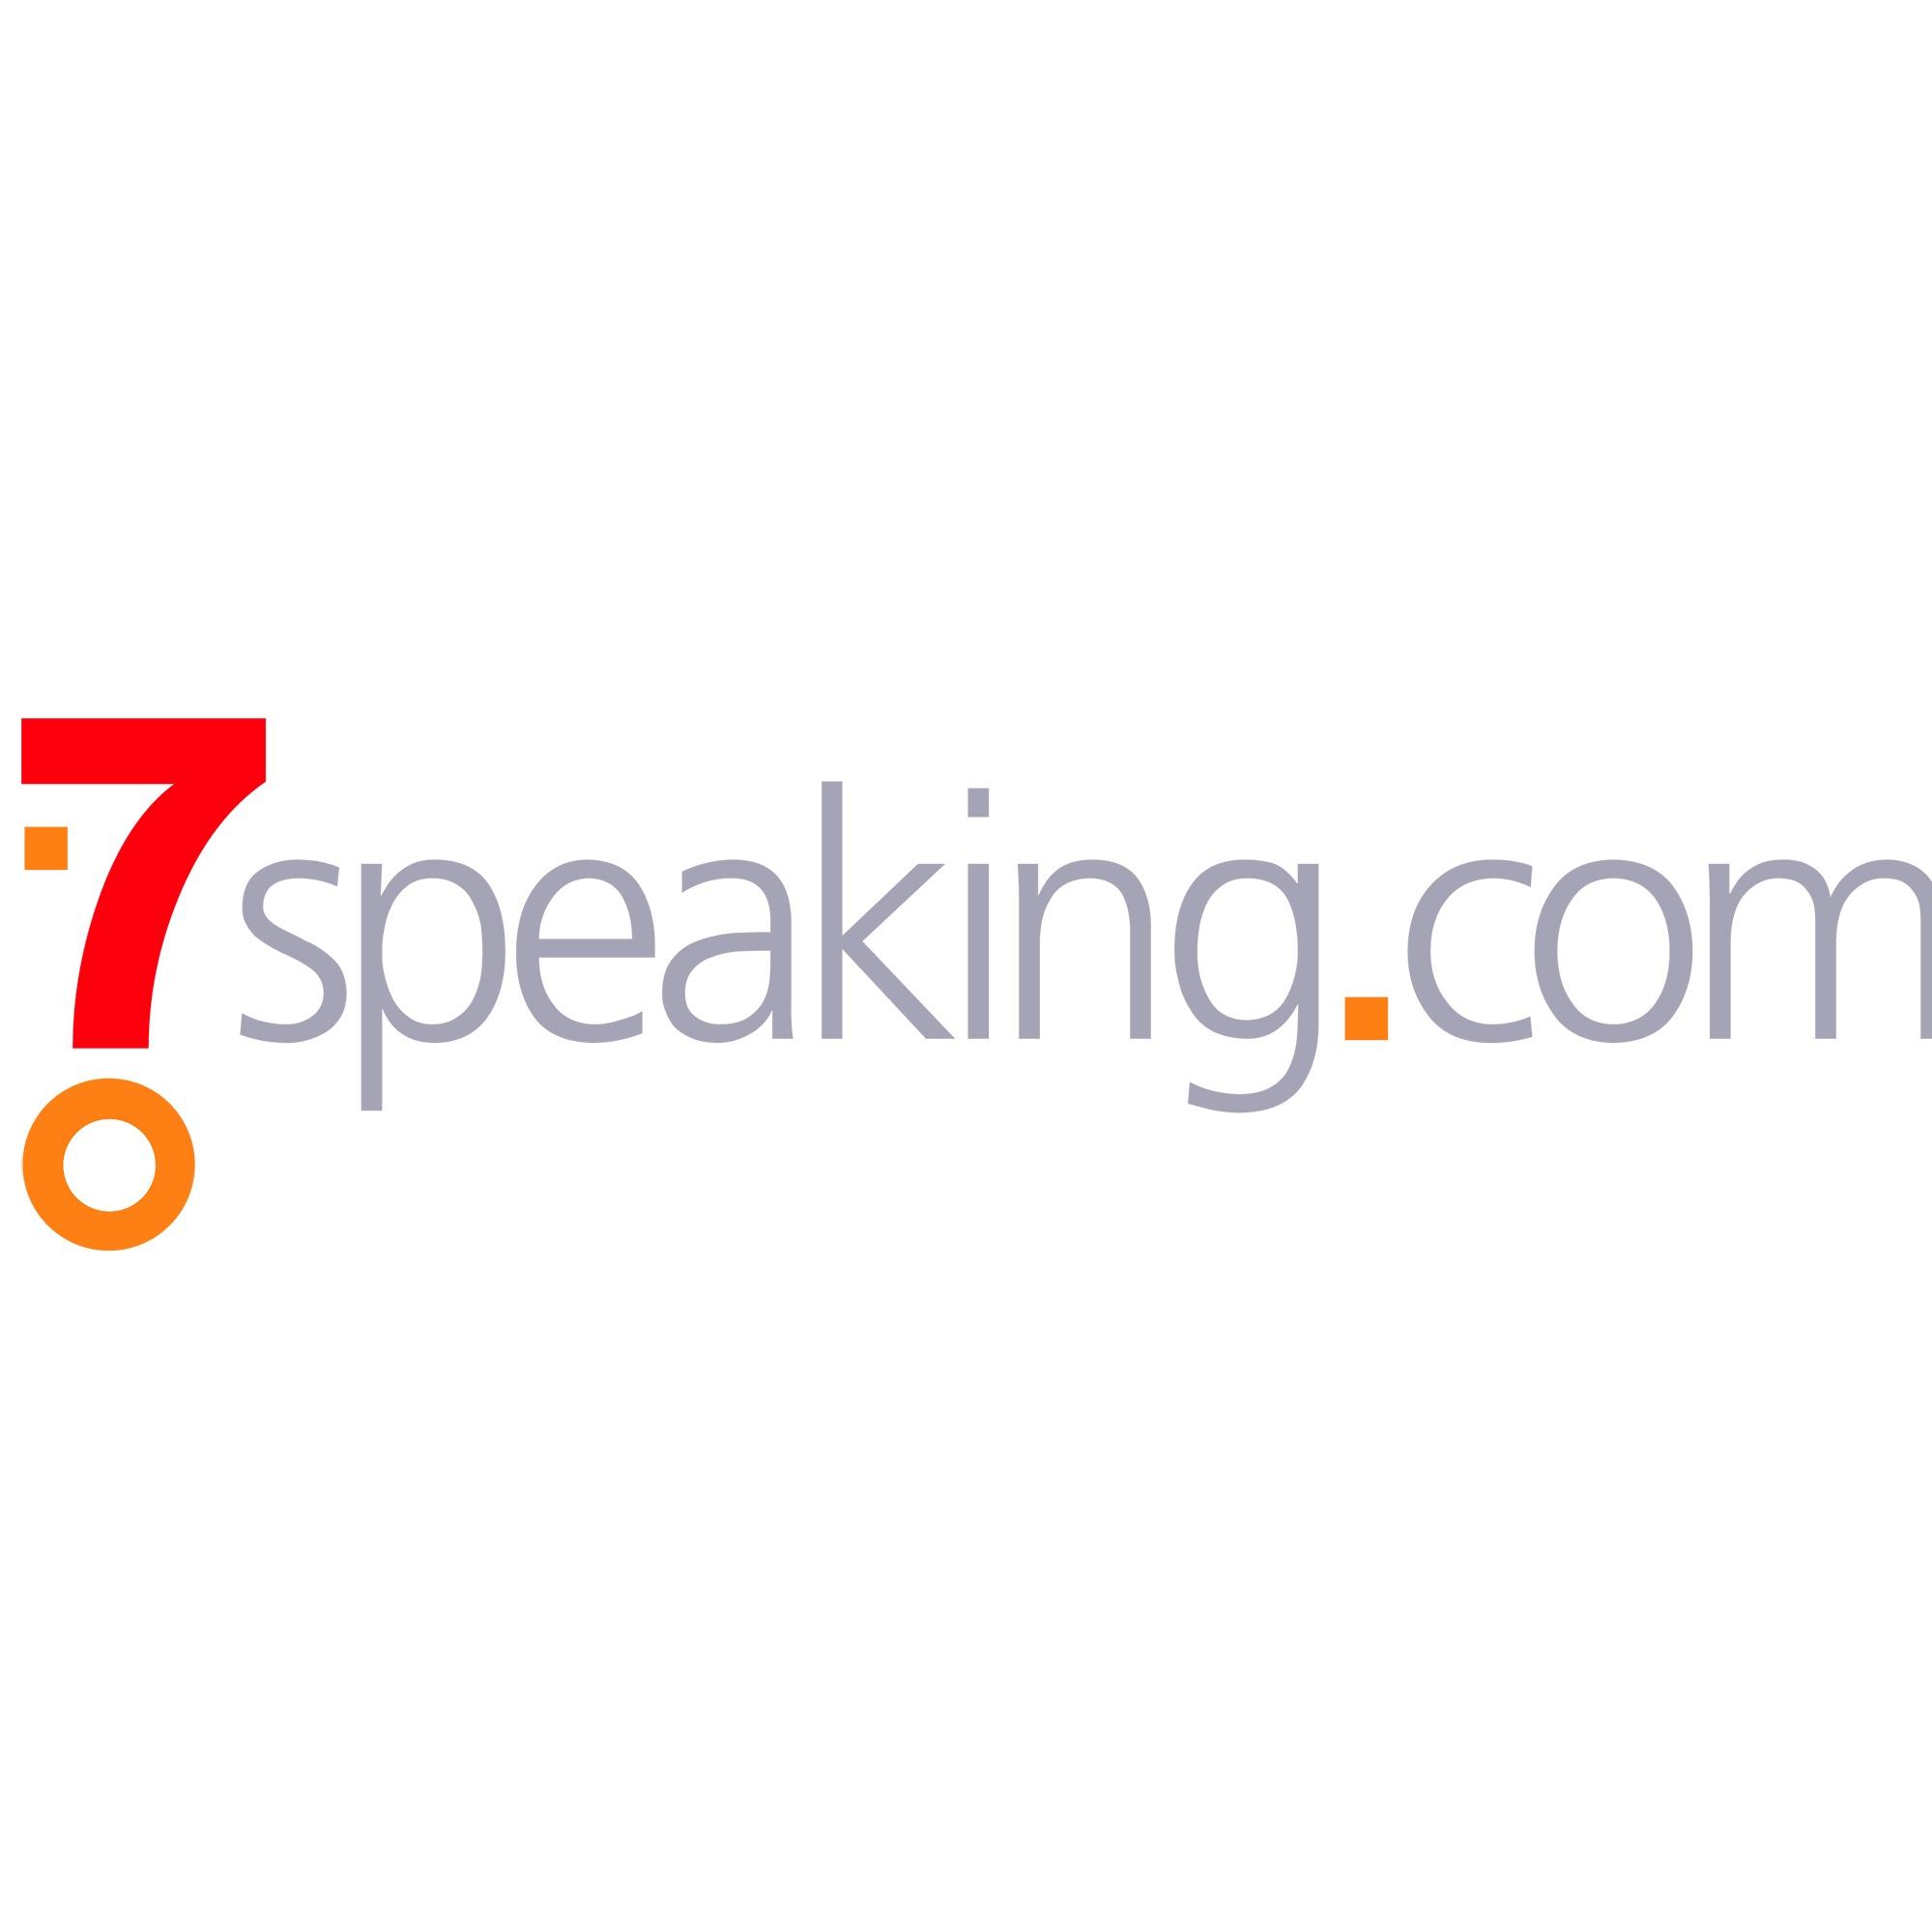 the 7Speaking logo.